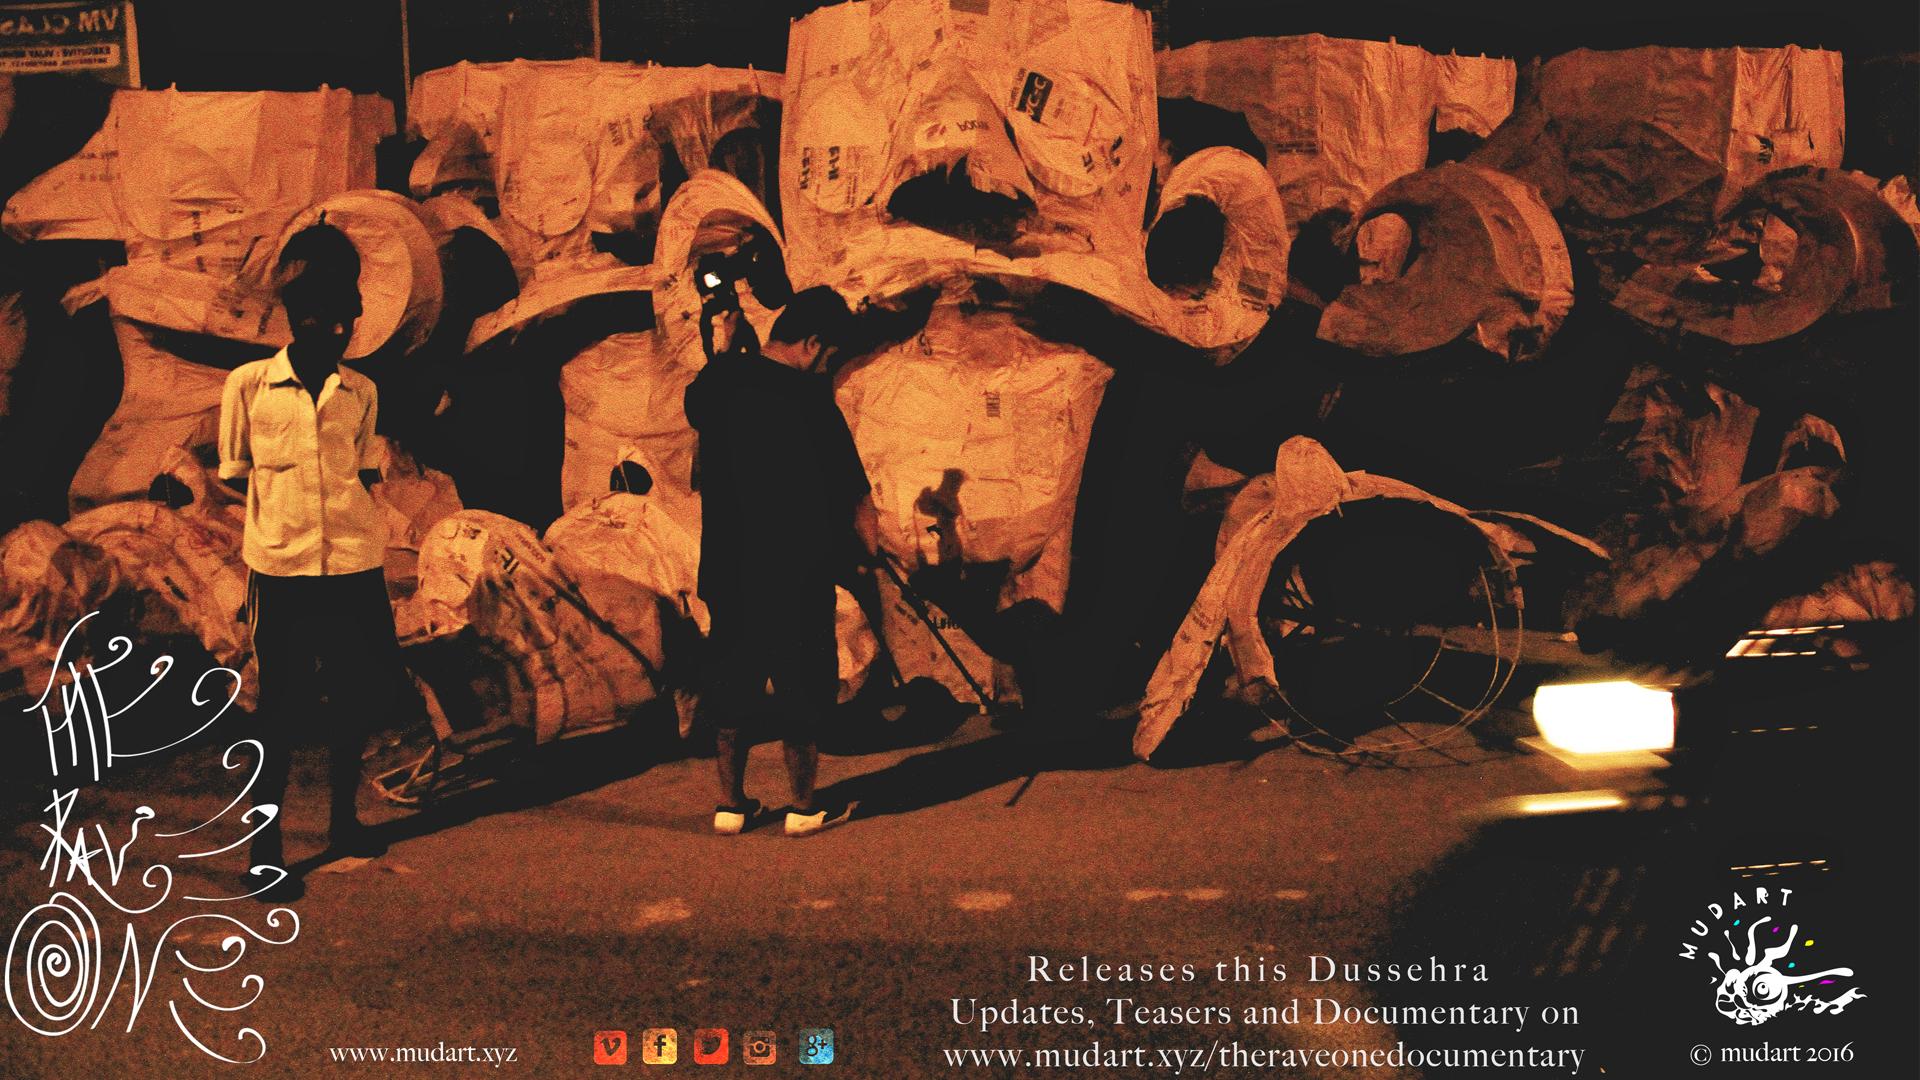 The Rave One, Ravan, Dussehra, Digital Campaign, social cause, Artists, Culture, Films